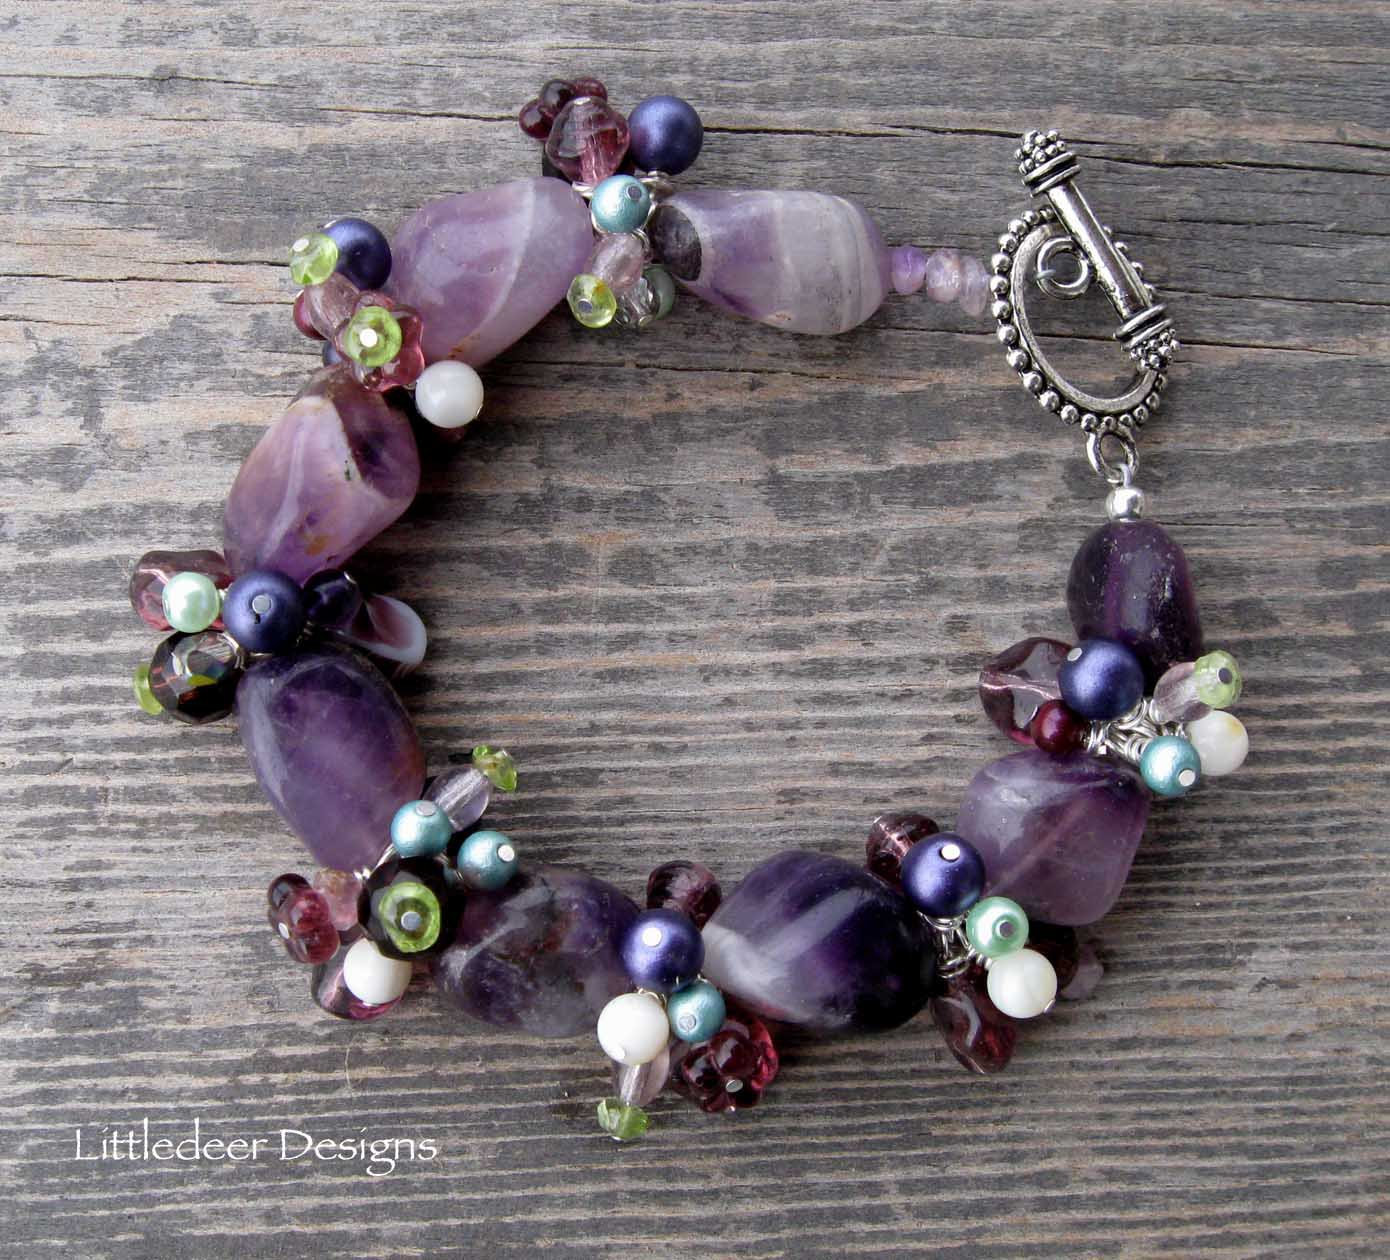 Handmade chevron amethyst with purple and green pearls bracelet